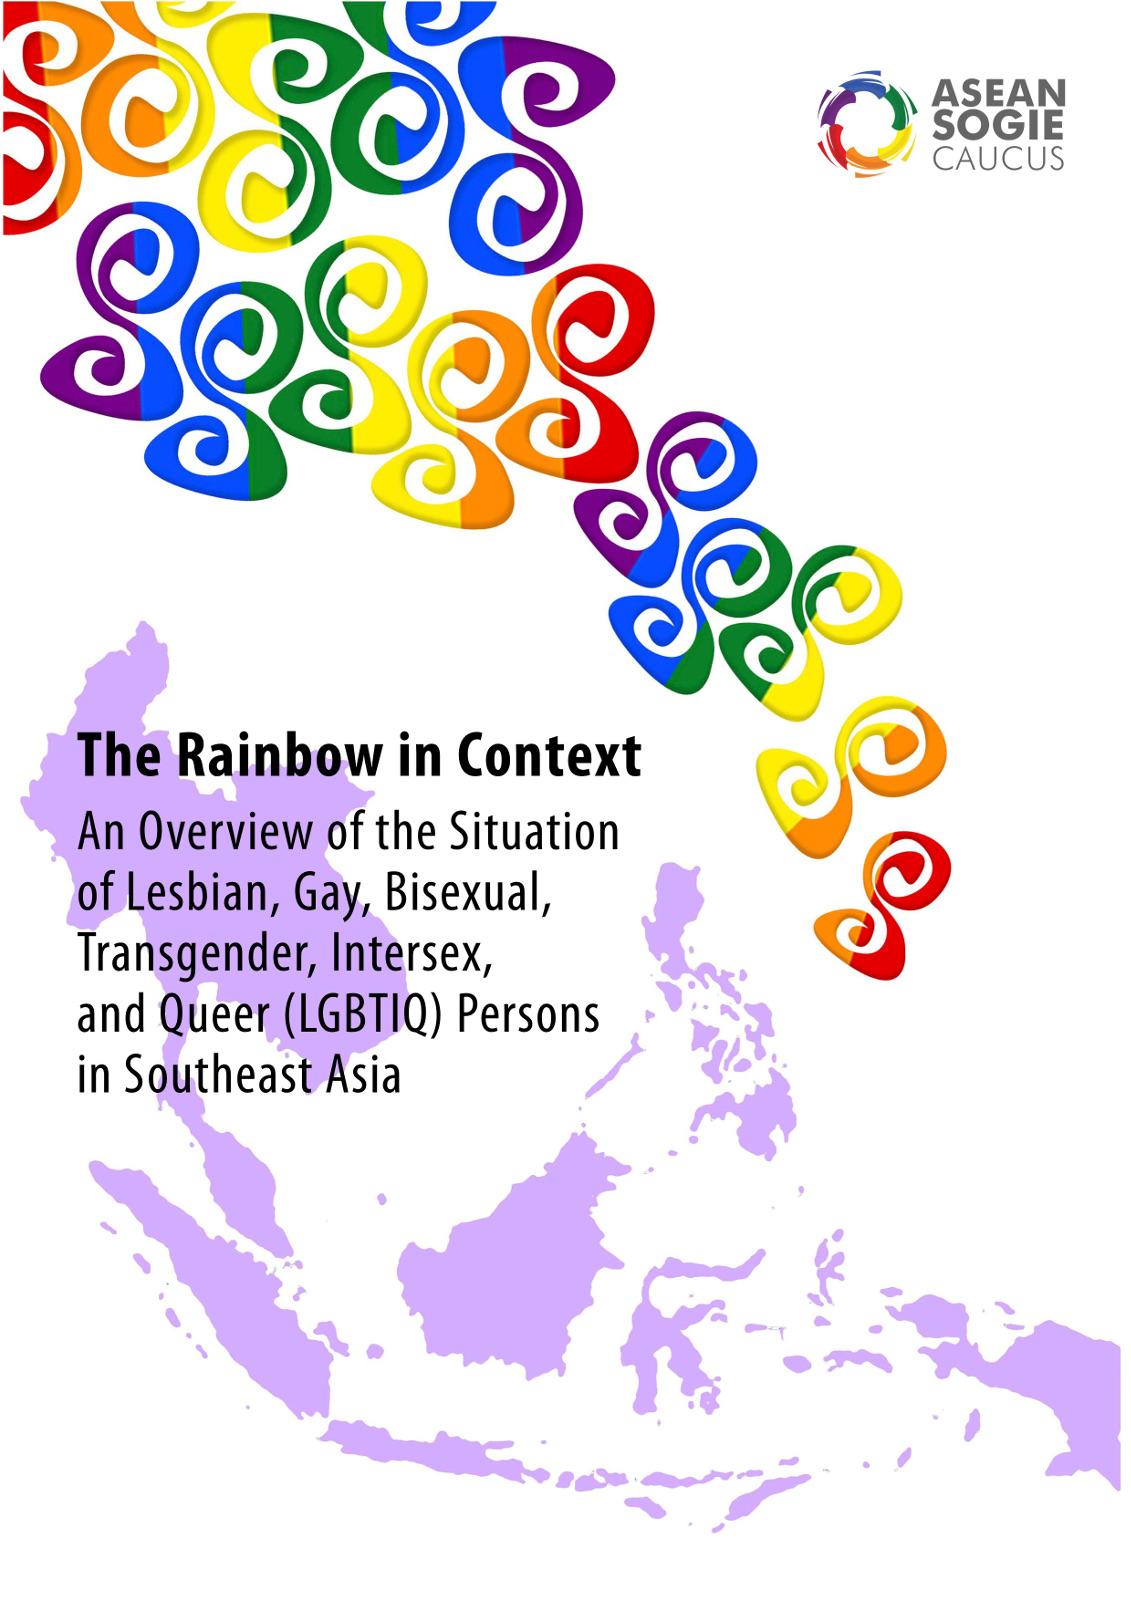 Gay lesbian transgender and bisexual individuals